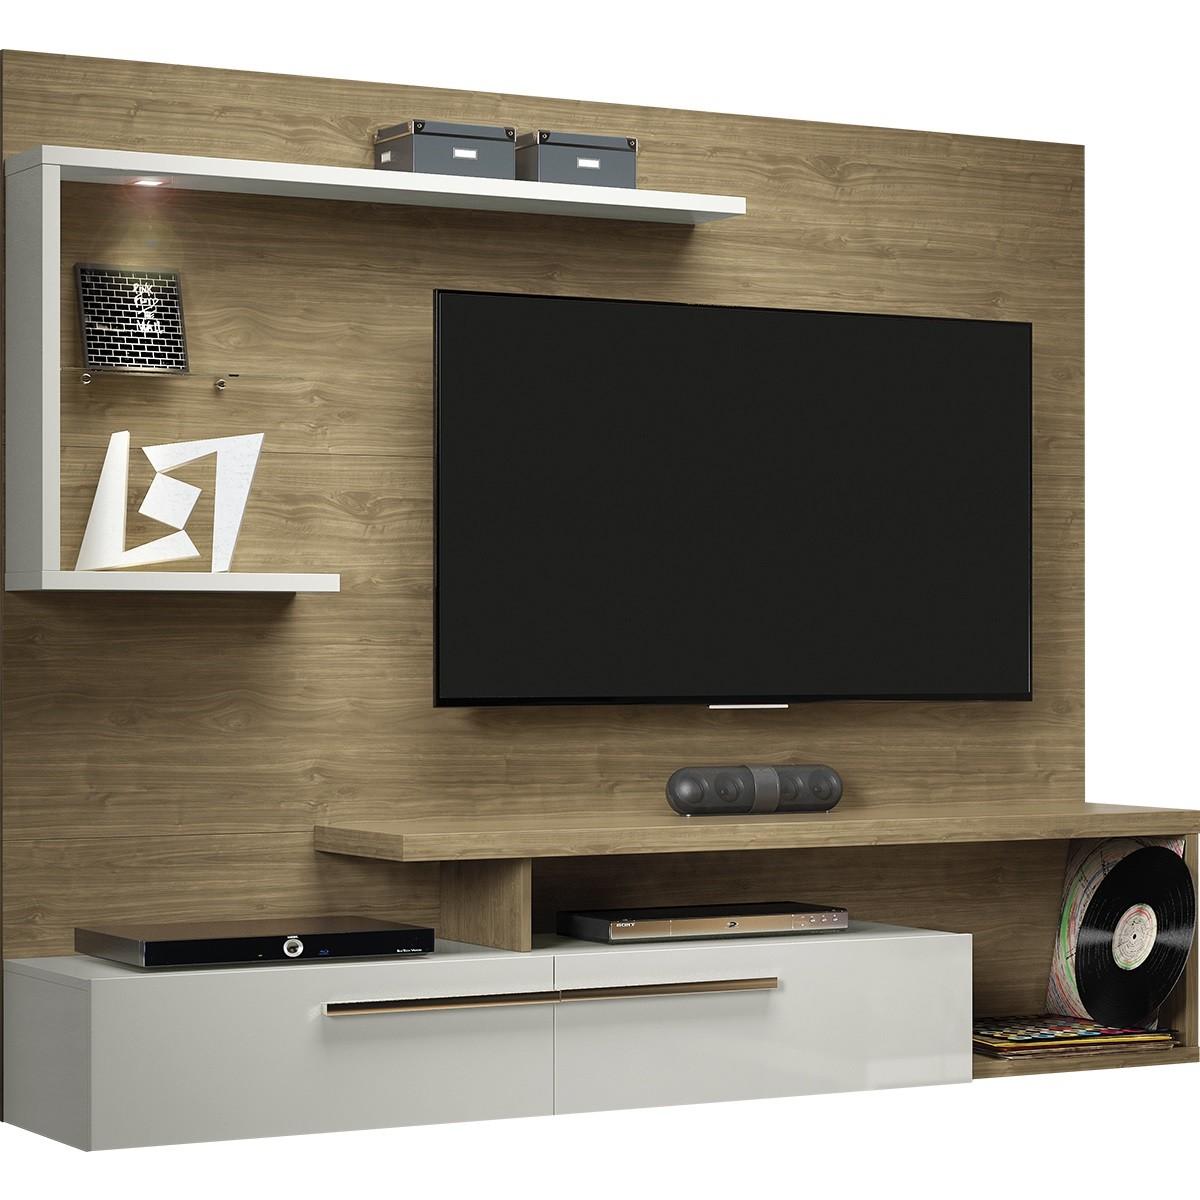 Painel para TV Floripa 182cm x 146cm Avela - Linea